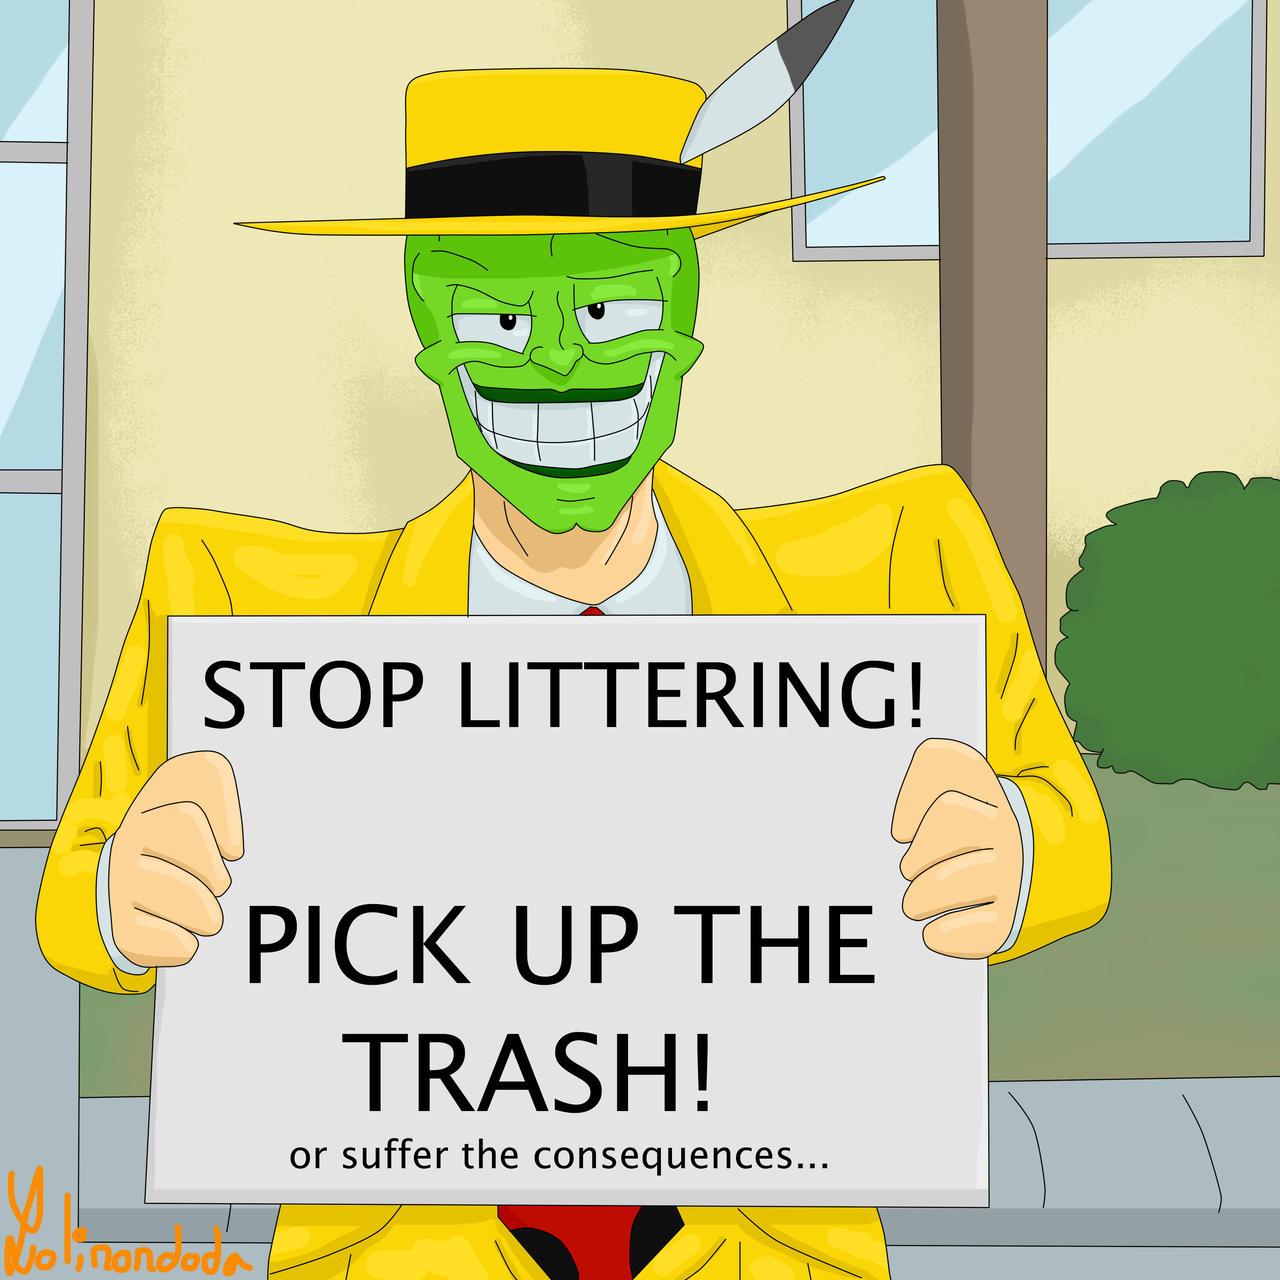 STOP LITTERING by Lolinondoda